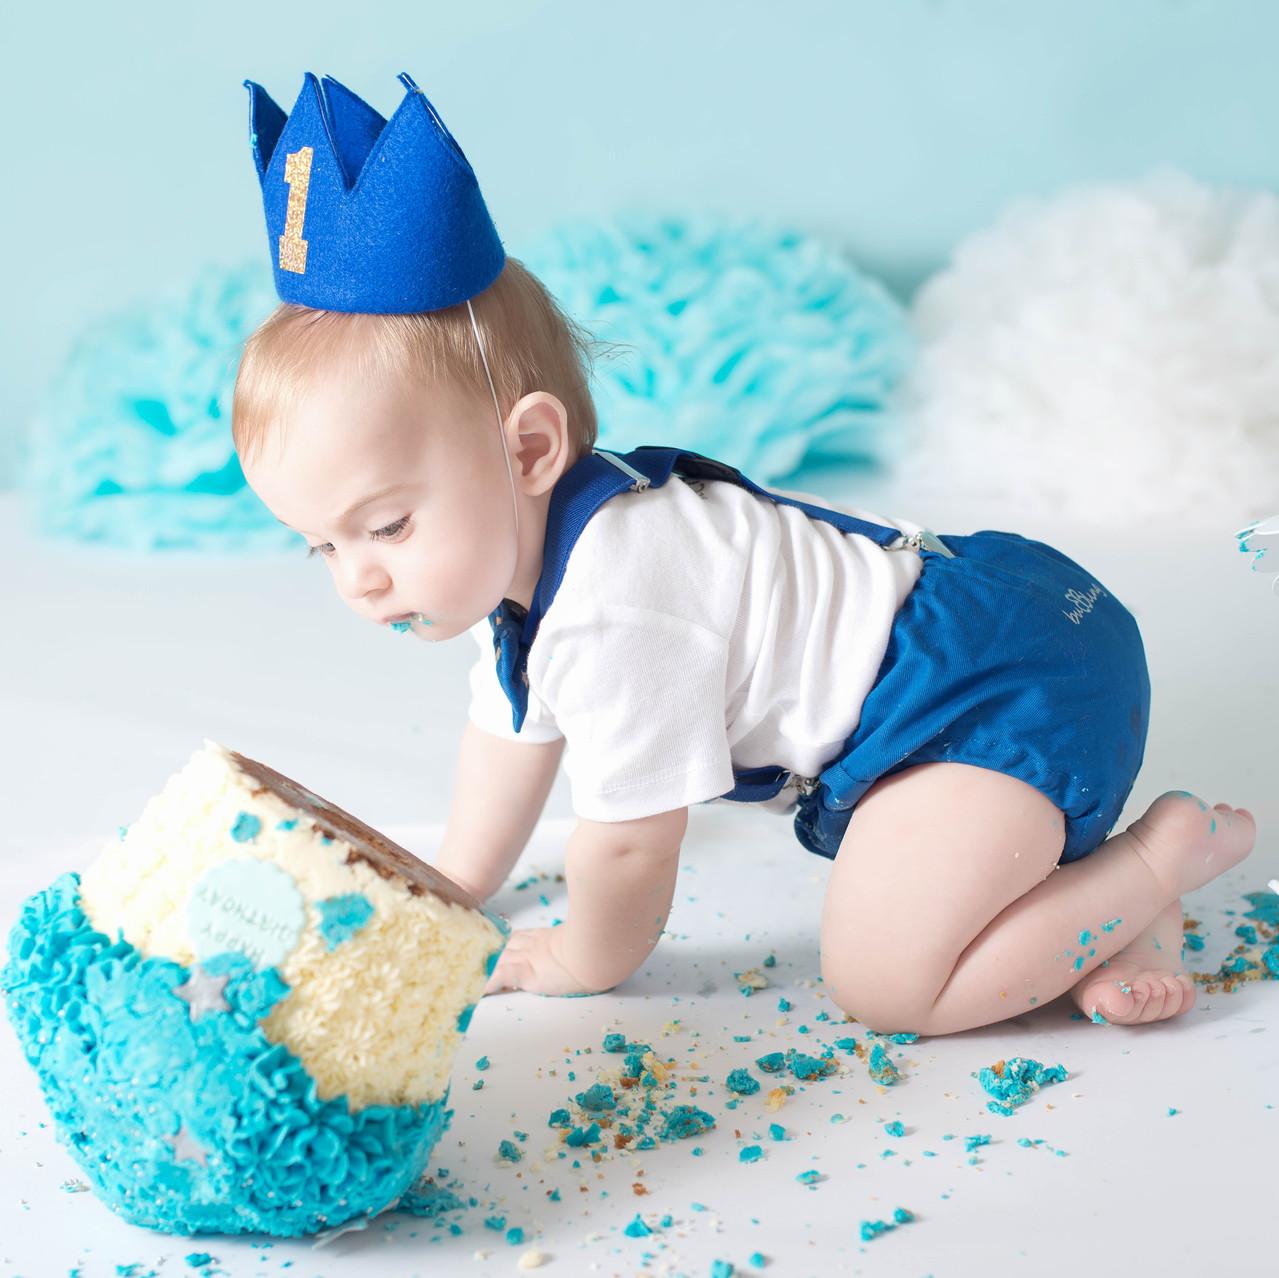 baby pushes cake onto floor